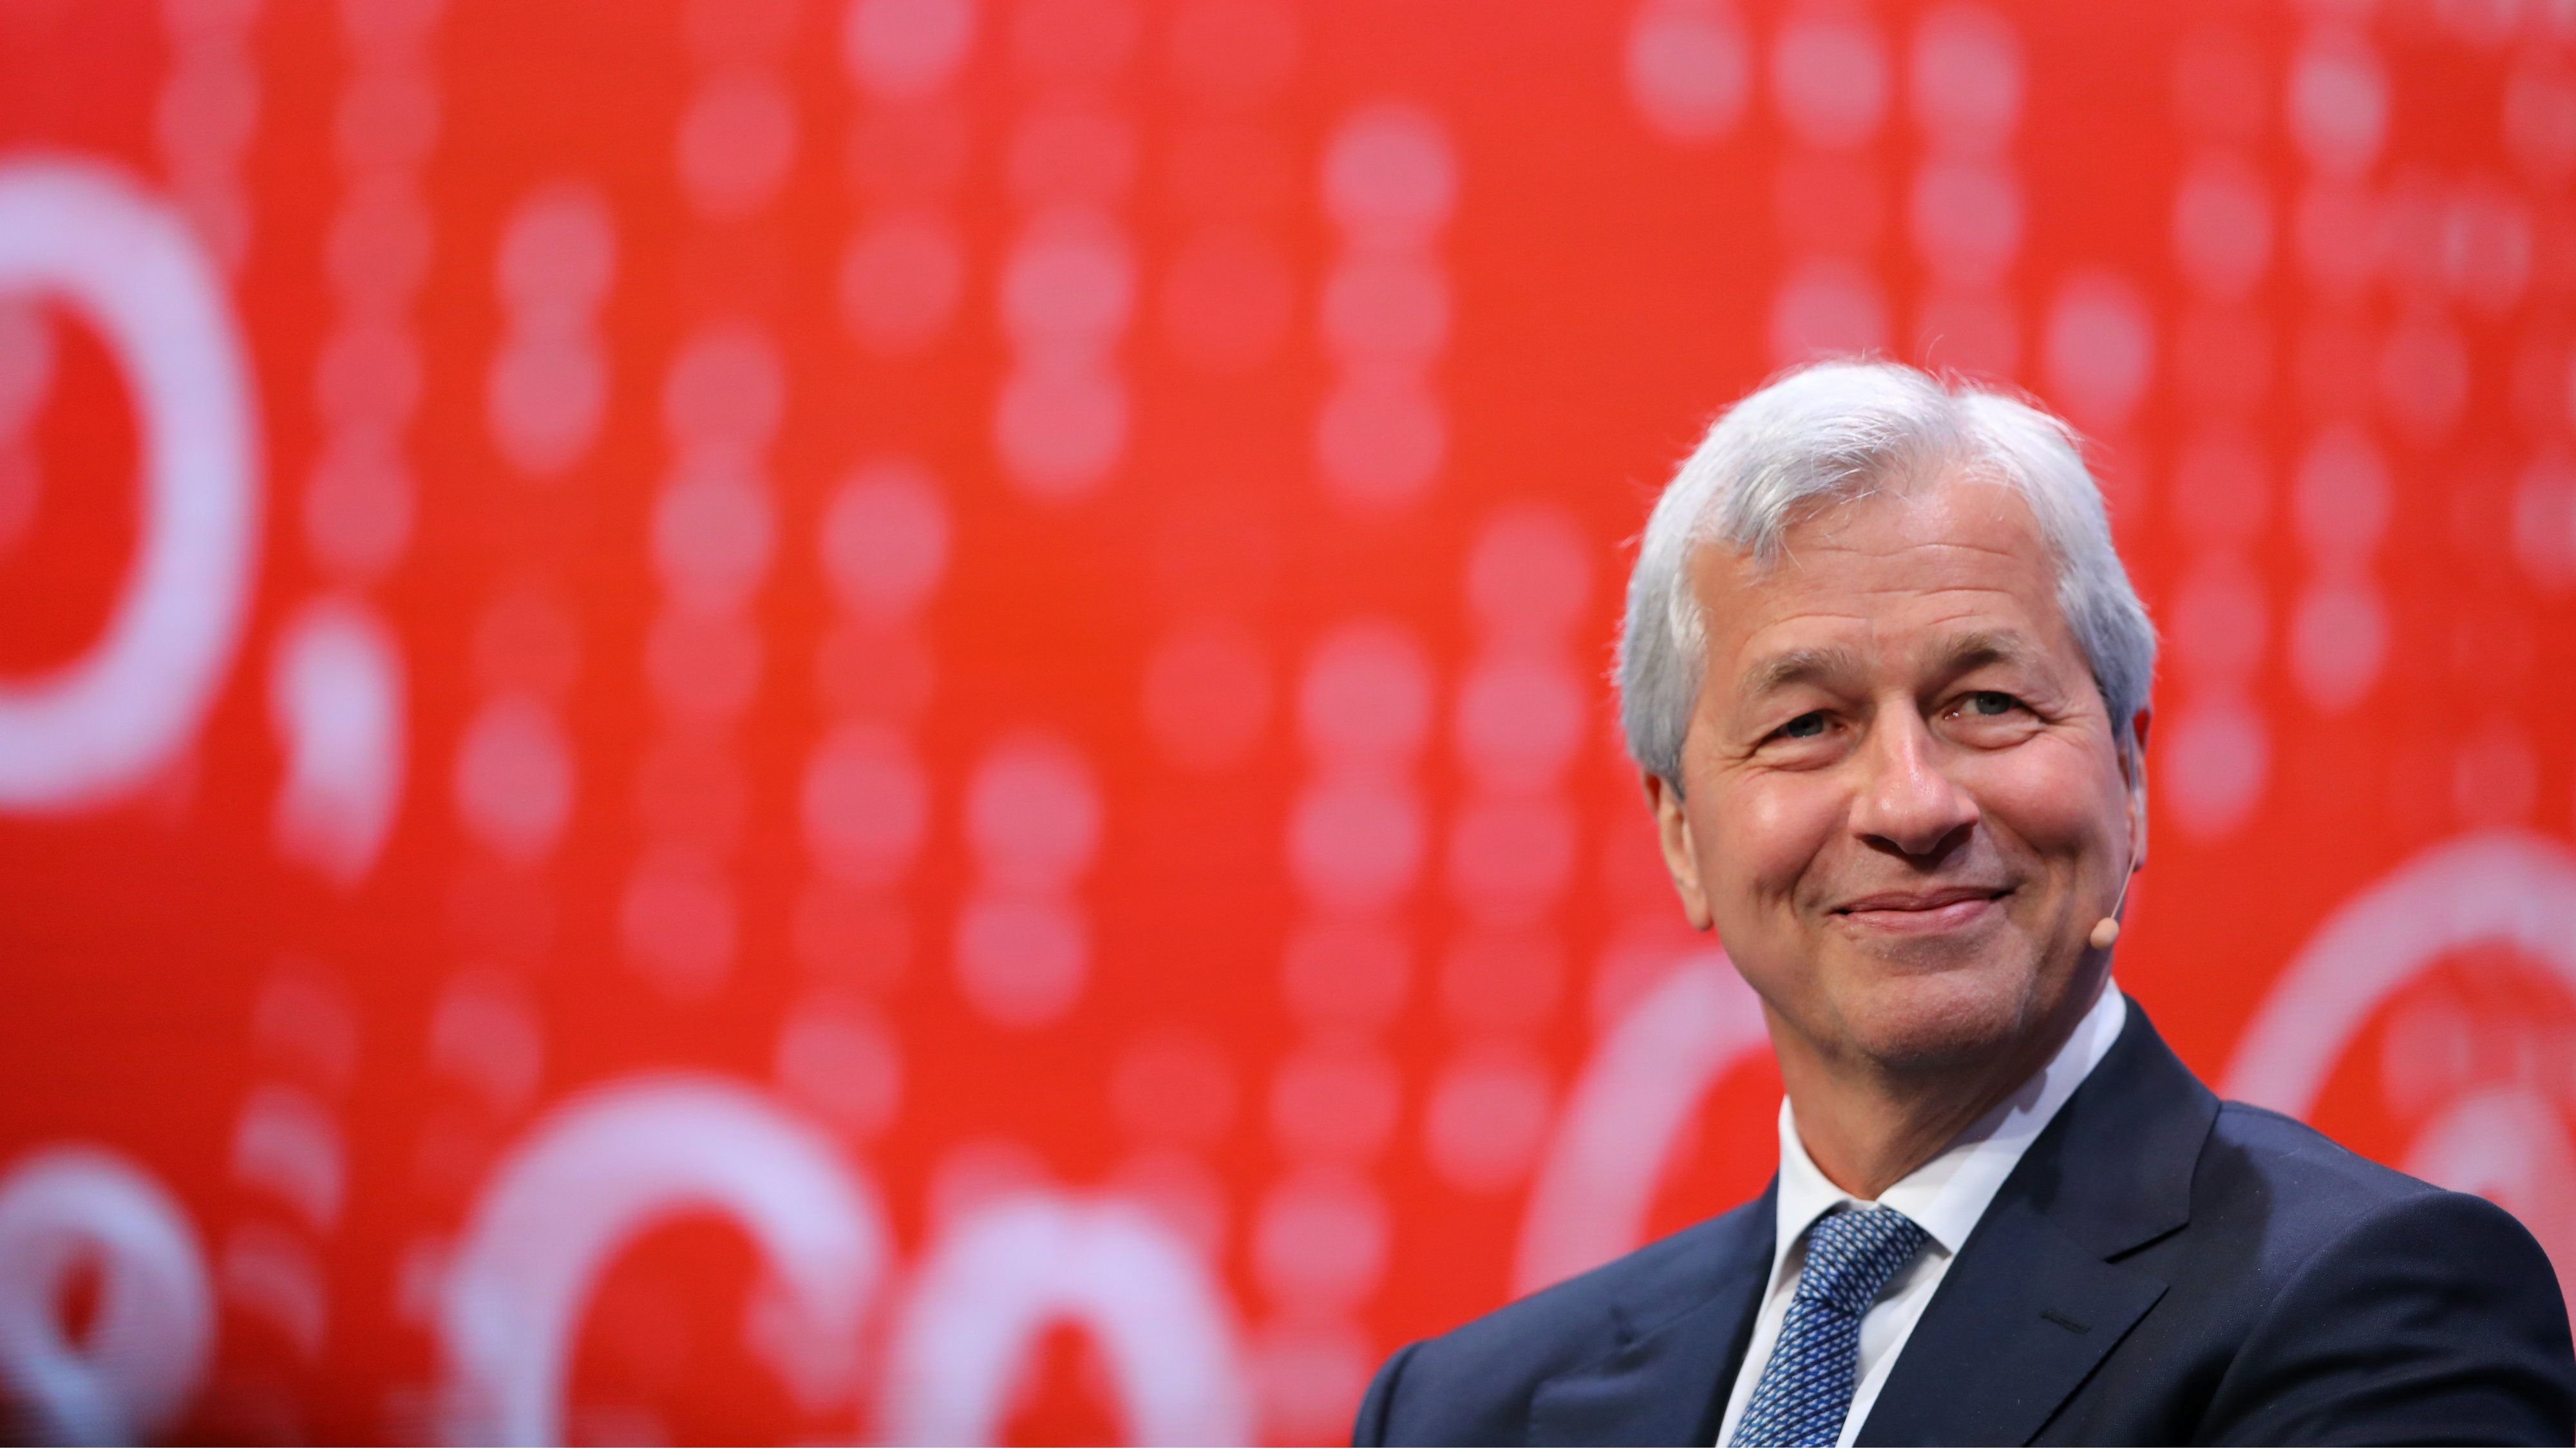 Jamie Dimon couldn't be happier with JPMorgan's $2.4 billion tax hit